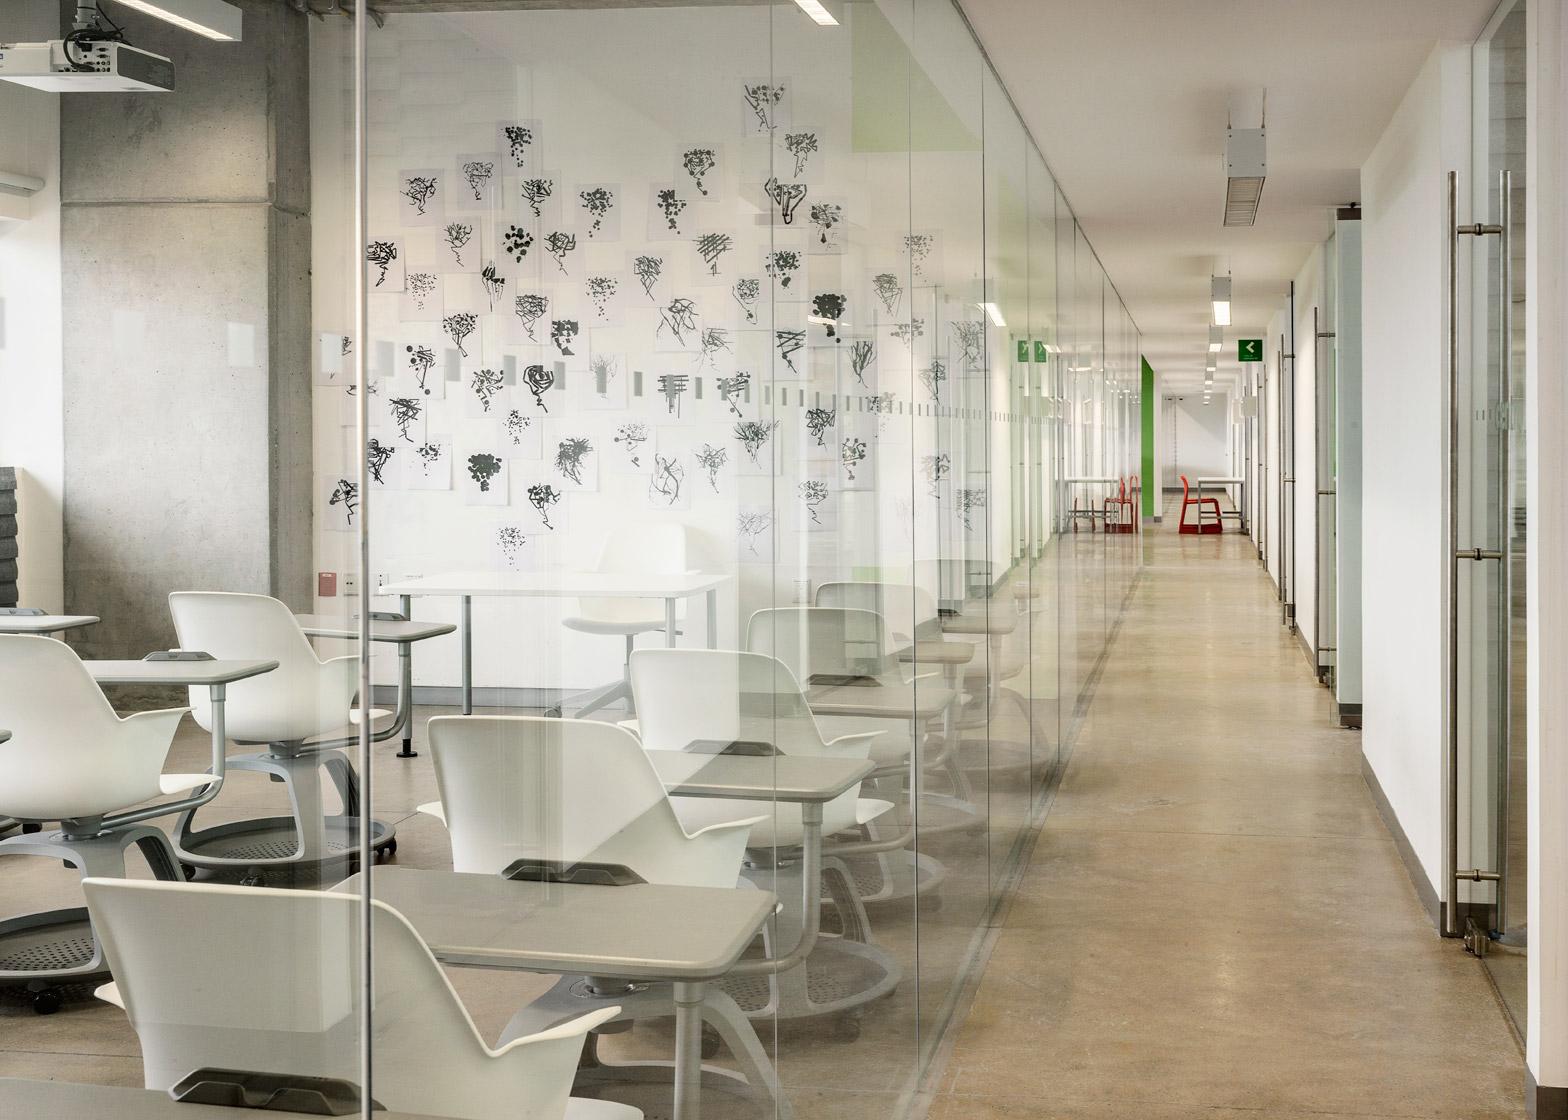 New campus for Centro University by Ten Arquitectos